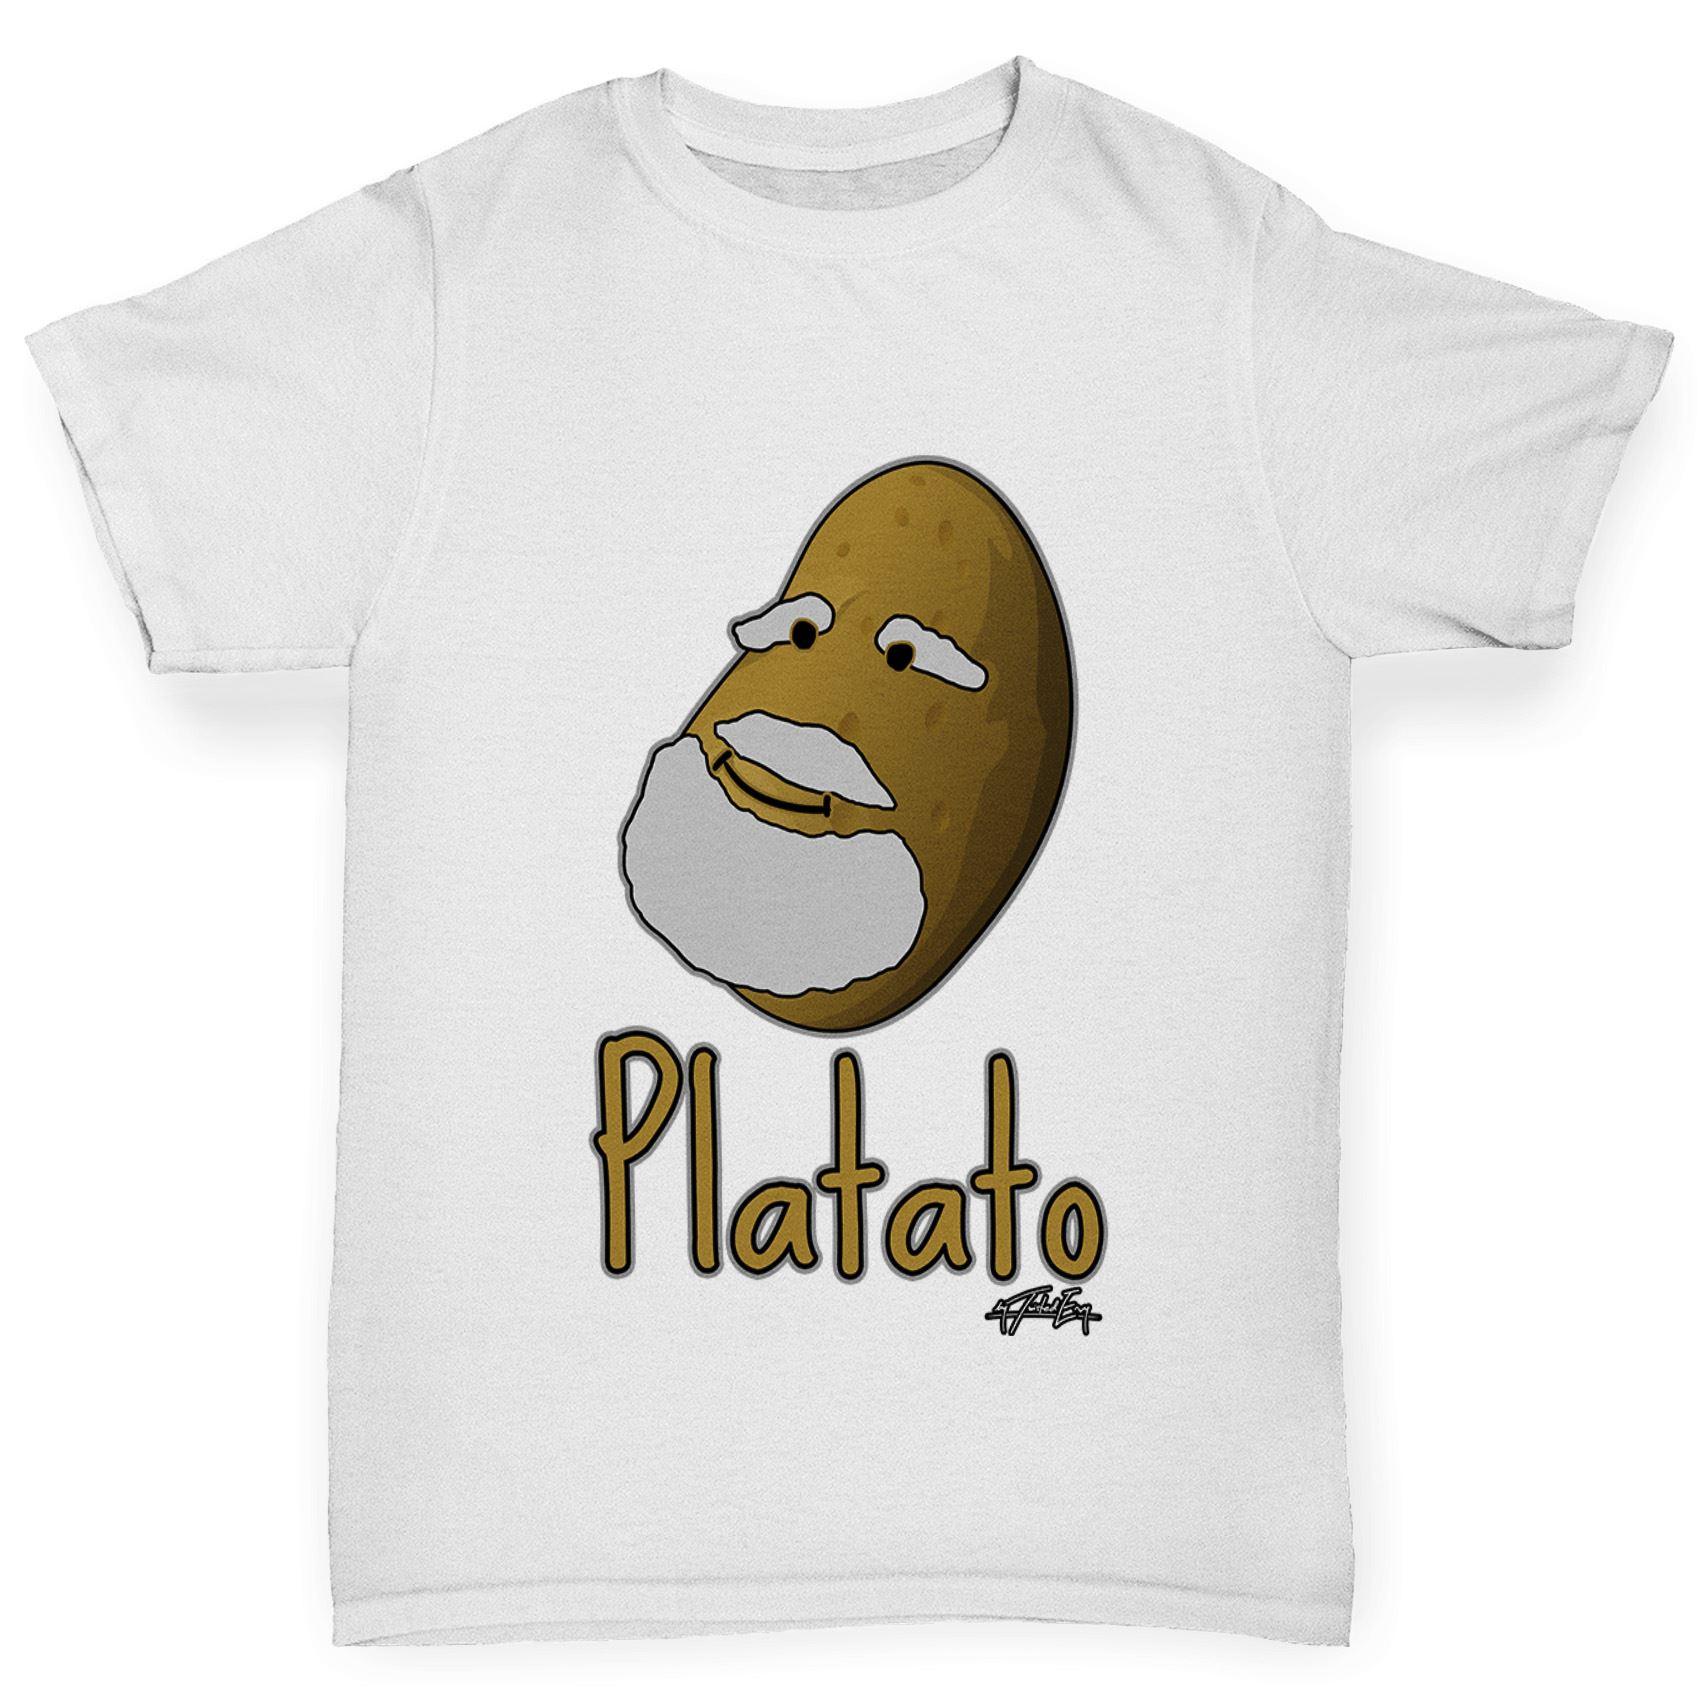 Twisted Envy Girl/'s Platato Plato Funny Cotton T-Shirt